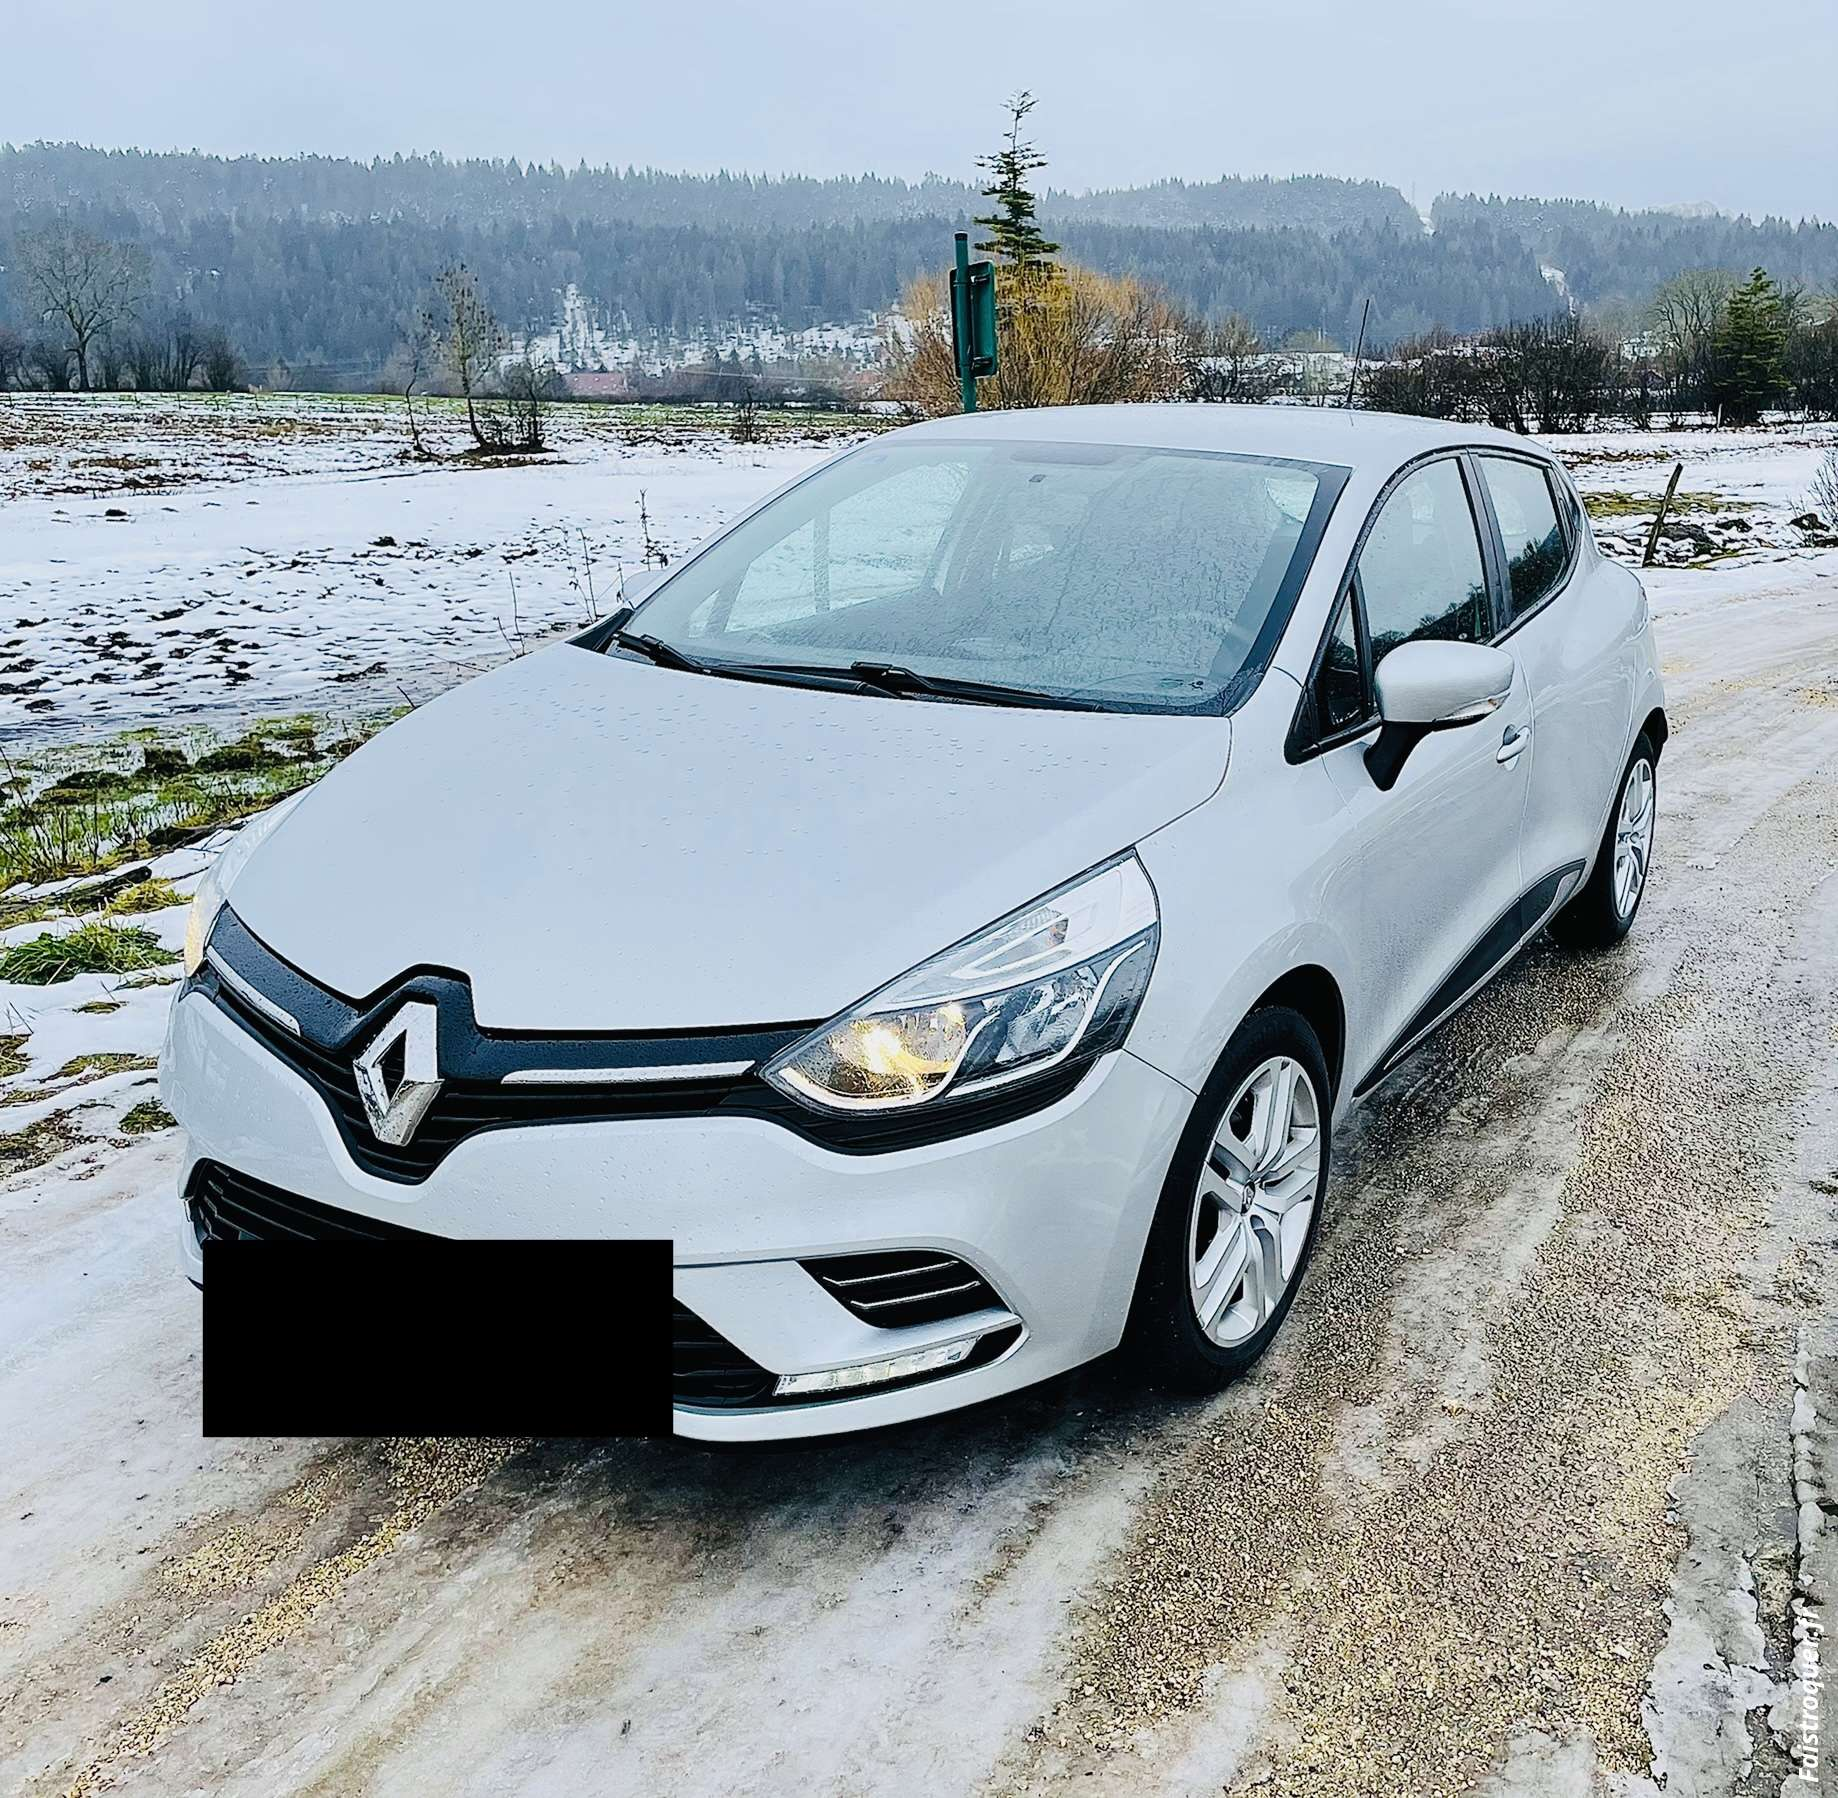 Clio tce 90cv, 14800km neuve garantie renault